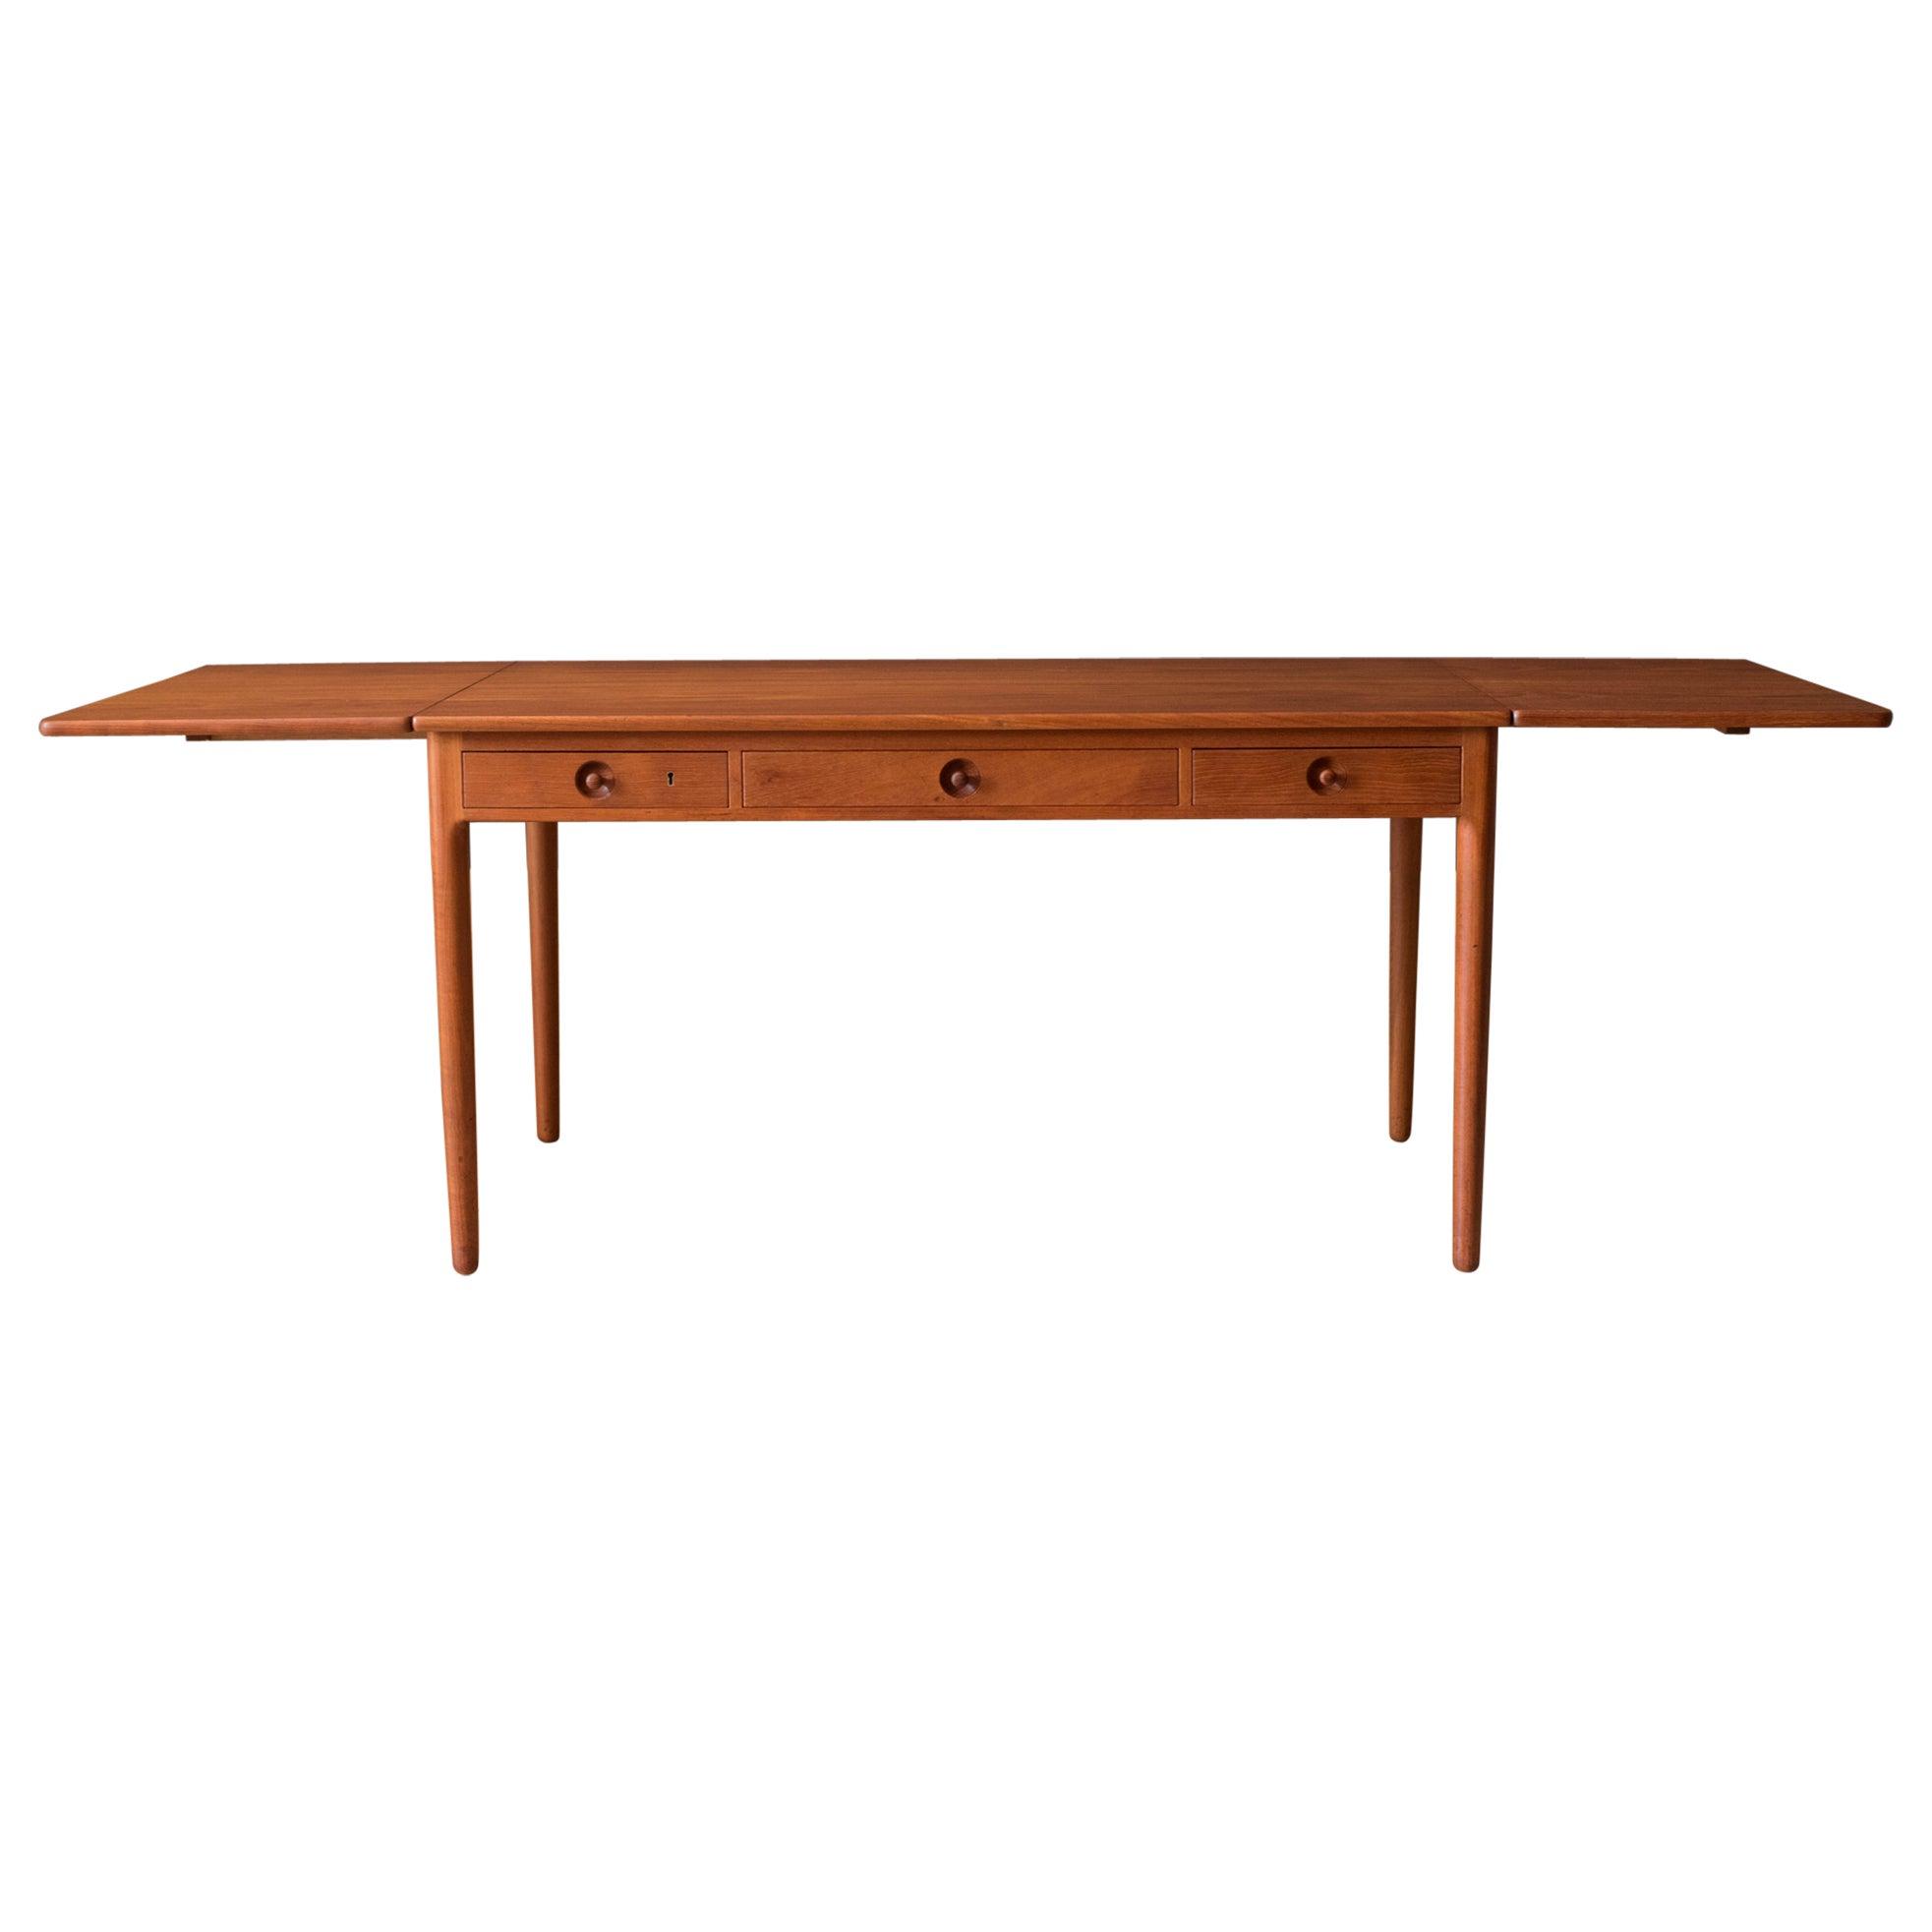 Danish Modern Teak AT-305 Hans J. Wegner Drop Leaf Writing Desk for Andreas Tuck